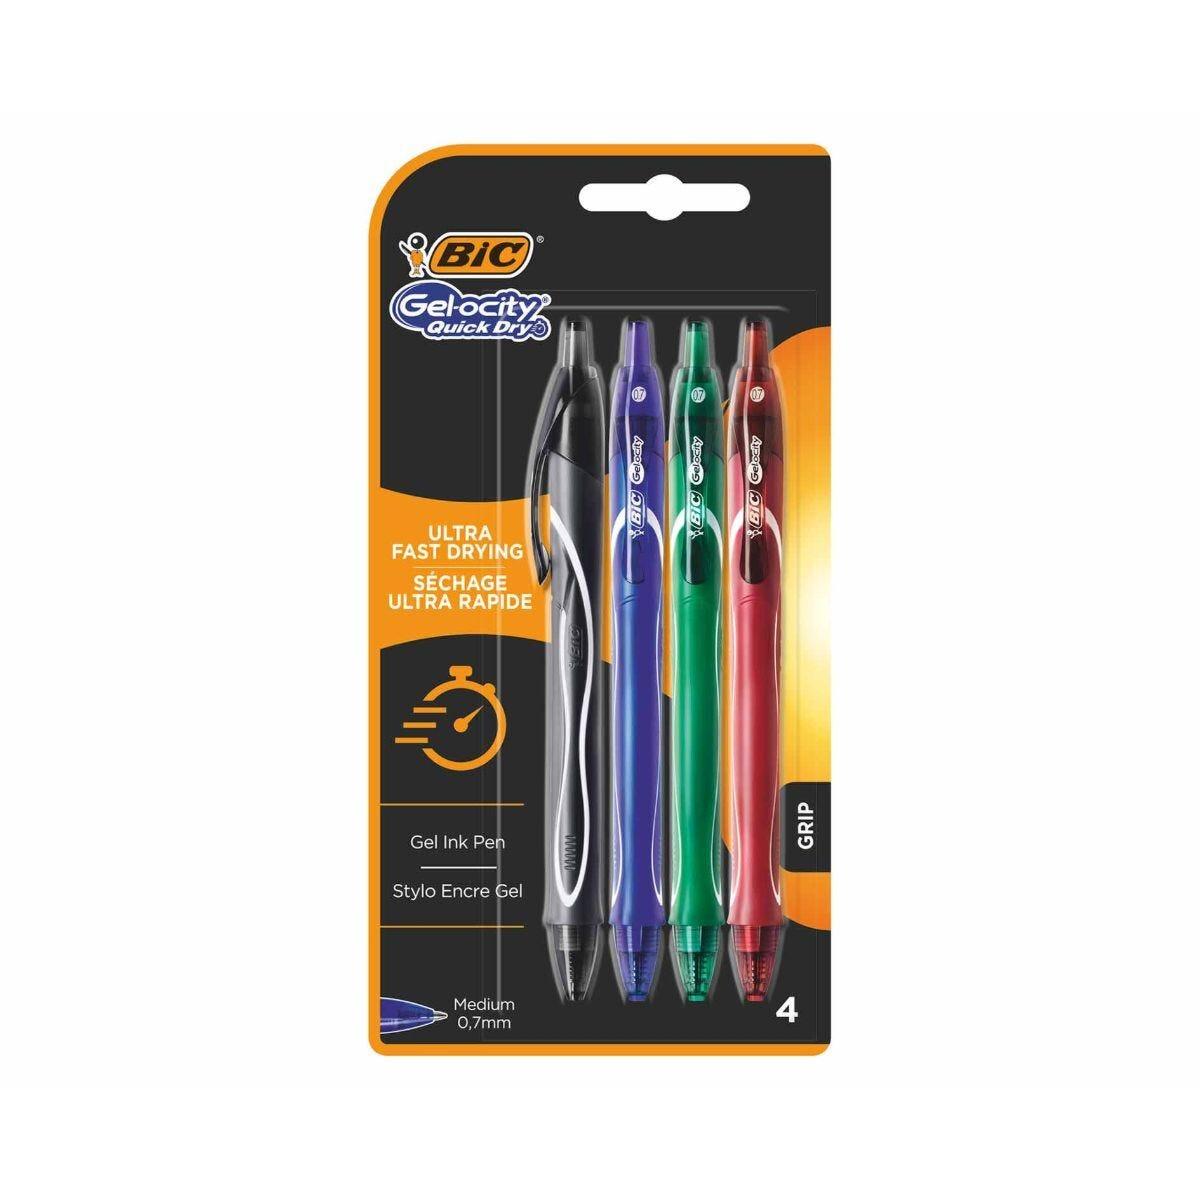 BiC Gelocity Gel Pens Pack of 4 Assorted